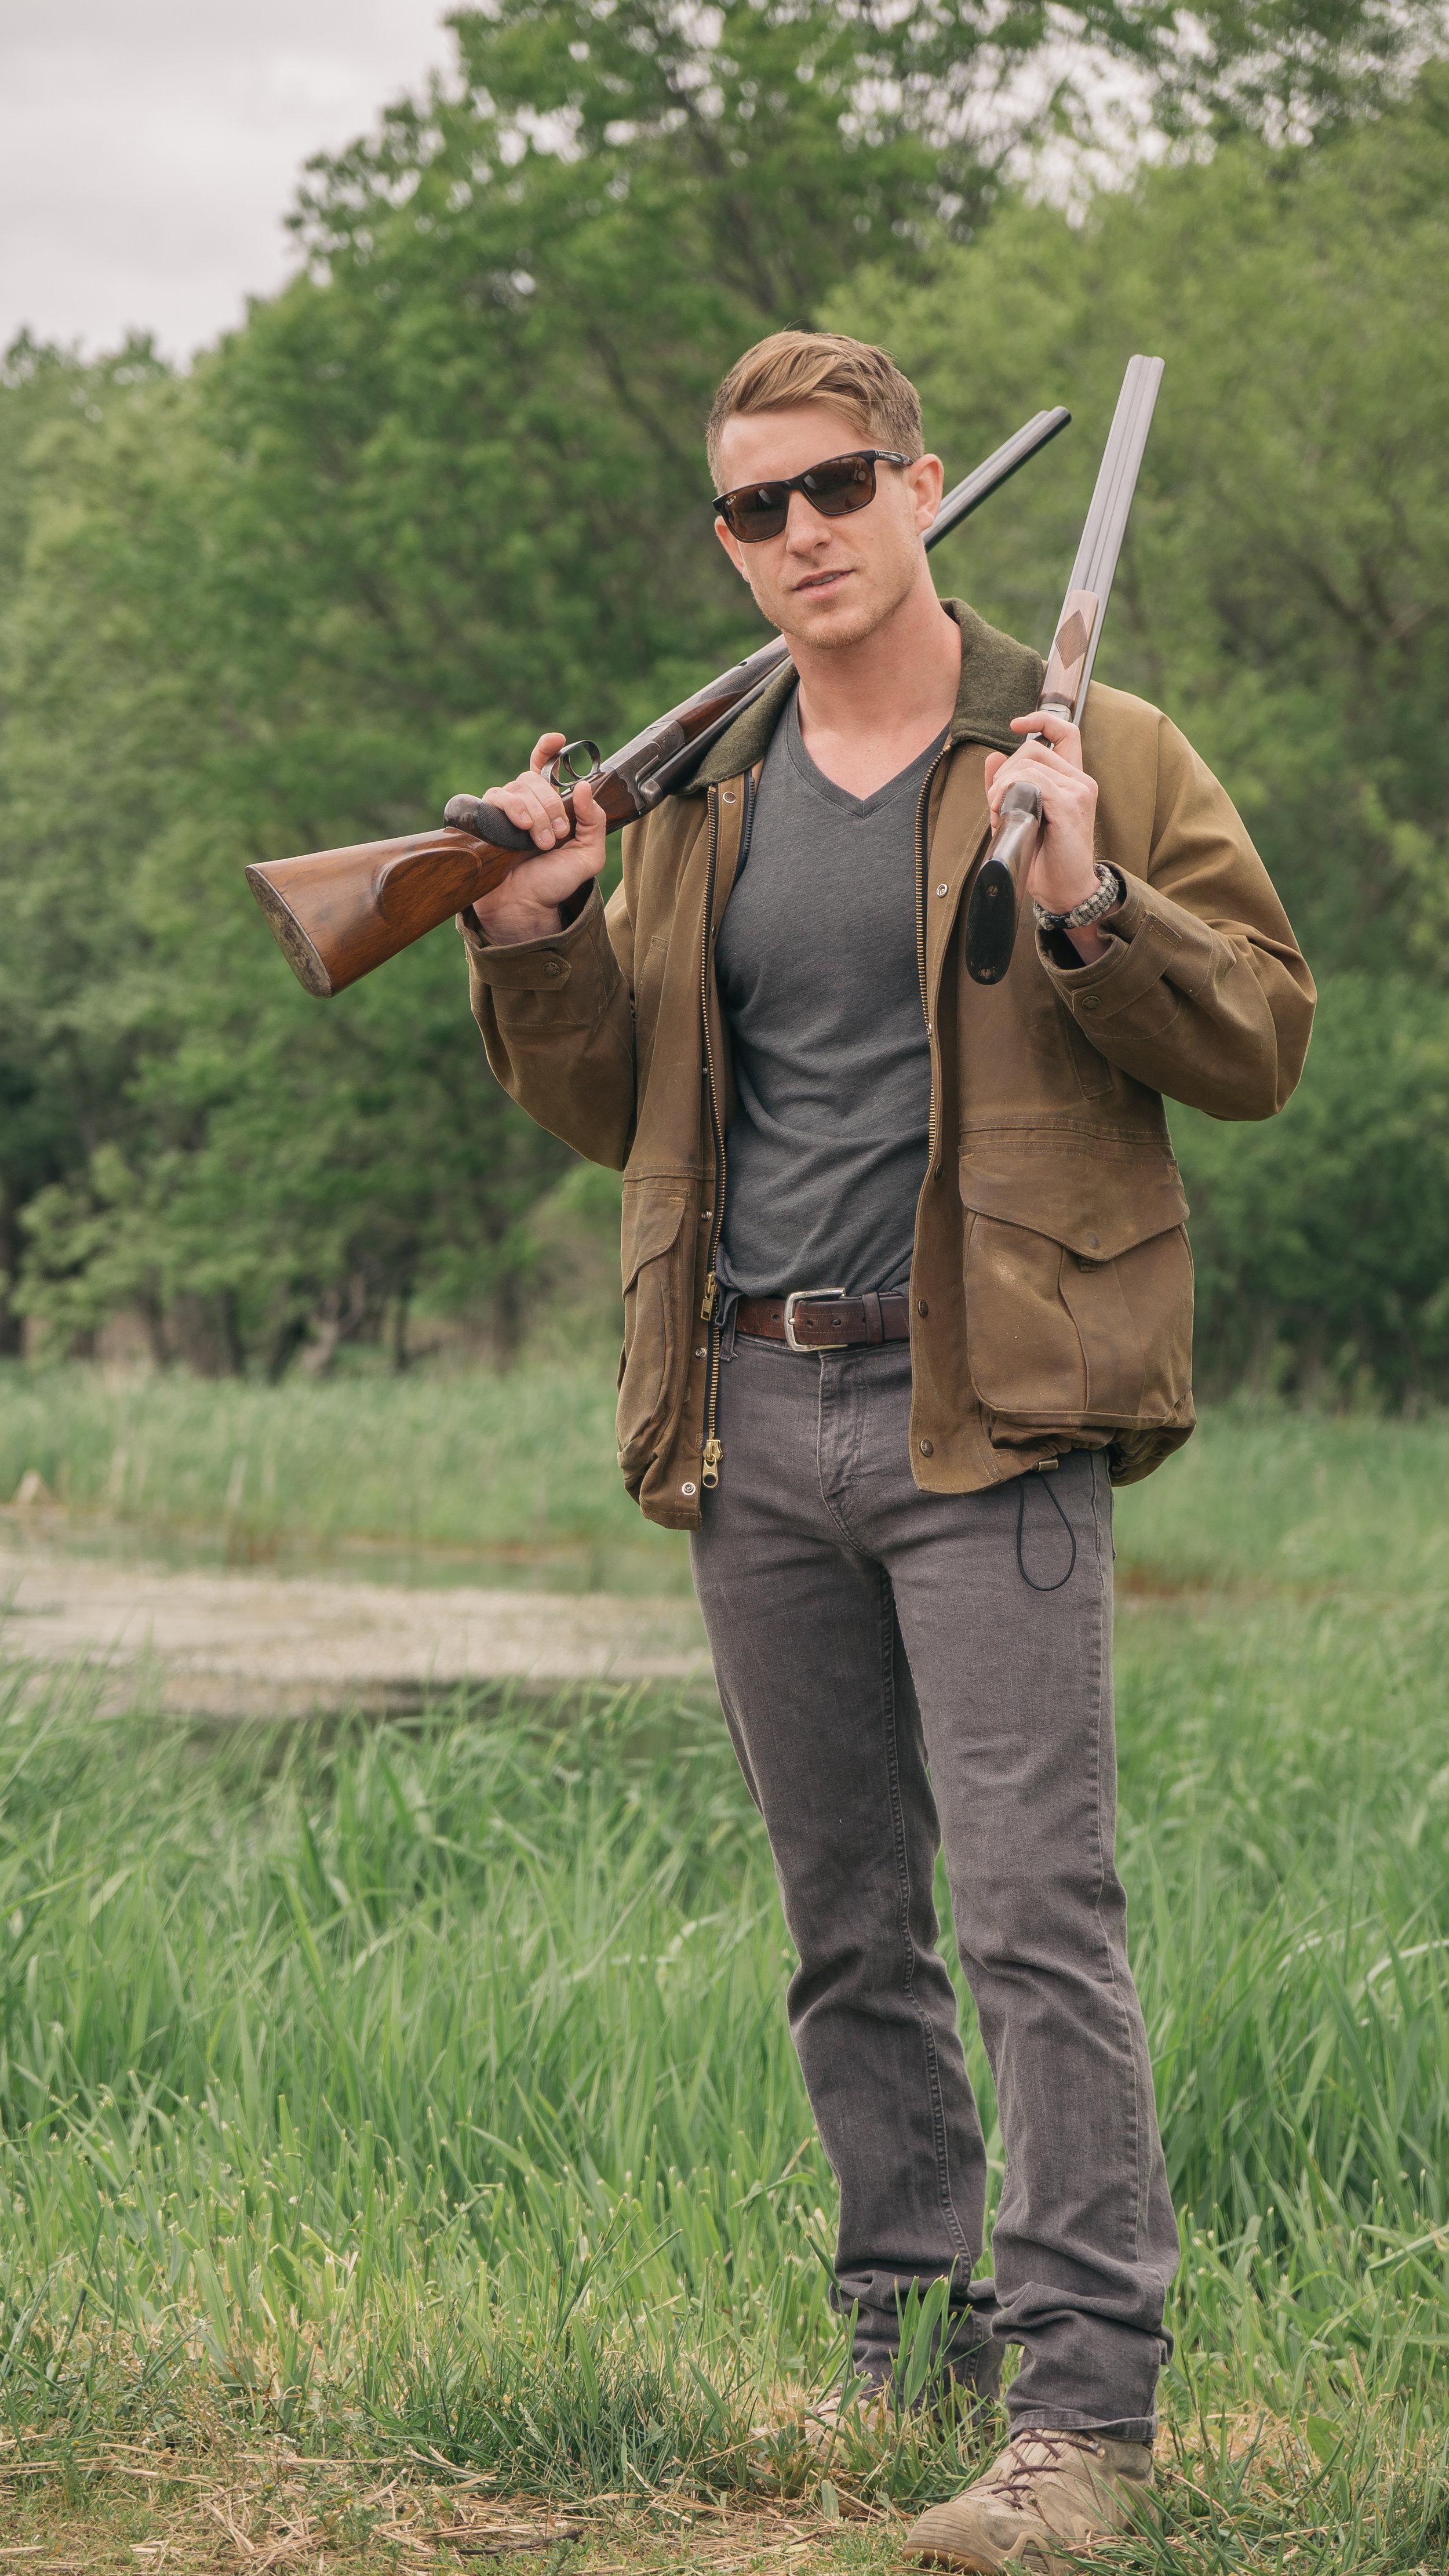 Daniel George shotgun shooting jacket